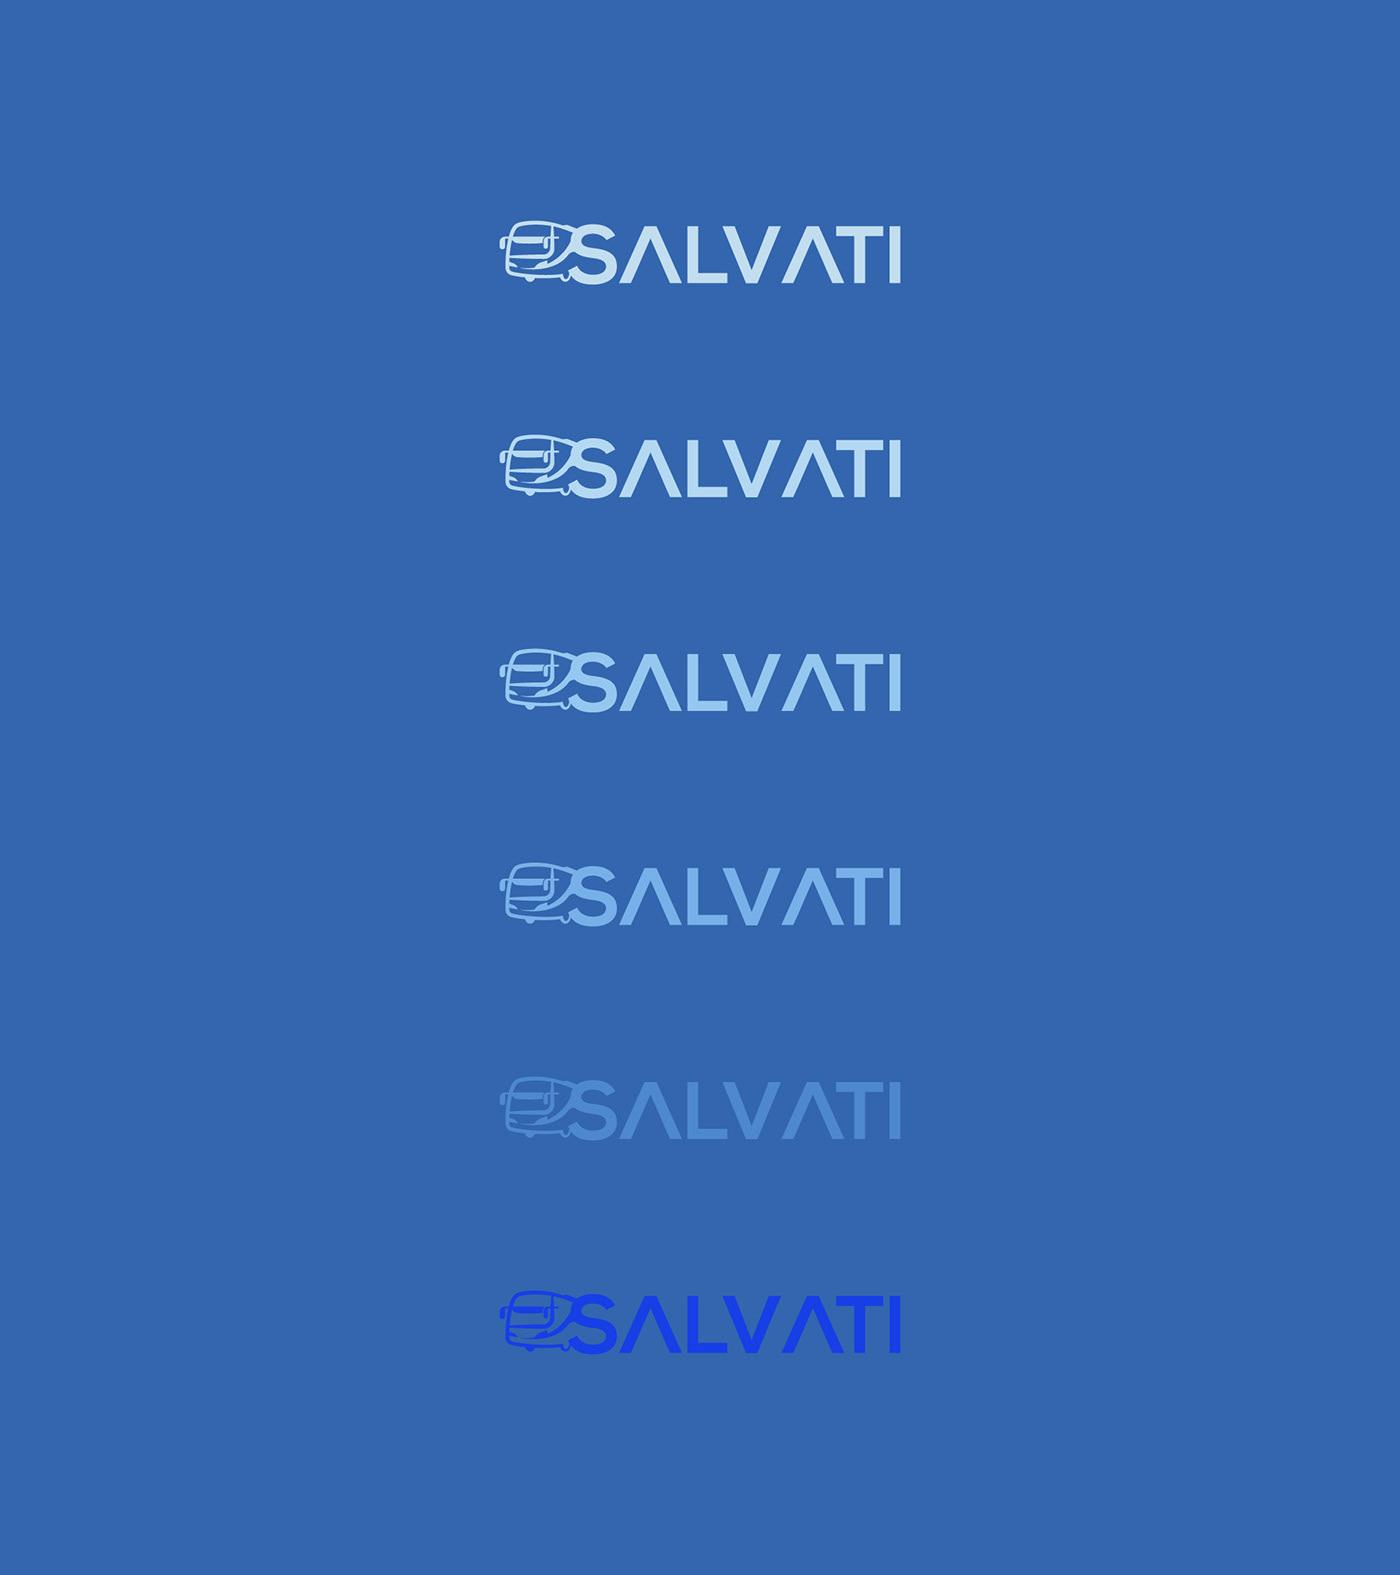 logomark color palette